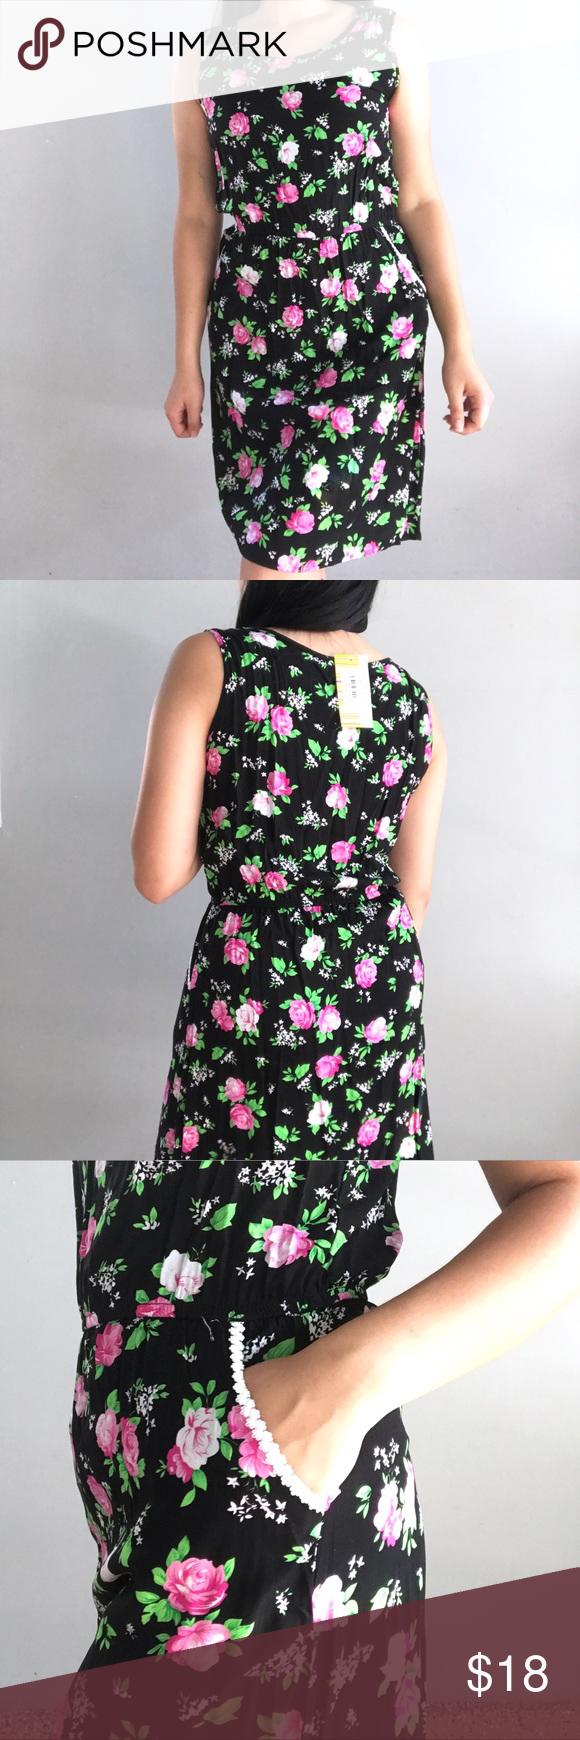 Floral Midi Dress Floral Midi Dress Clothes Design Floral Dress Black [ 1740 x 580 Pixel ]